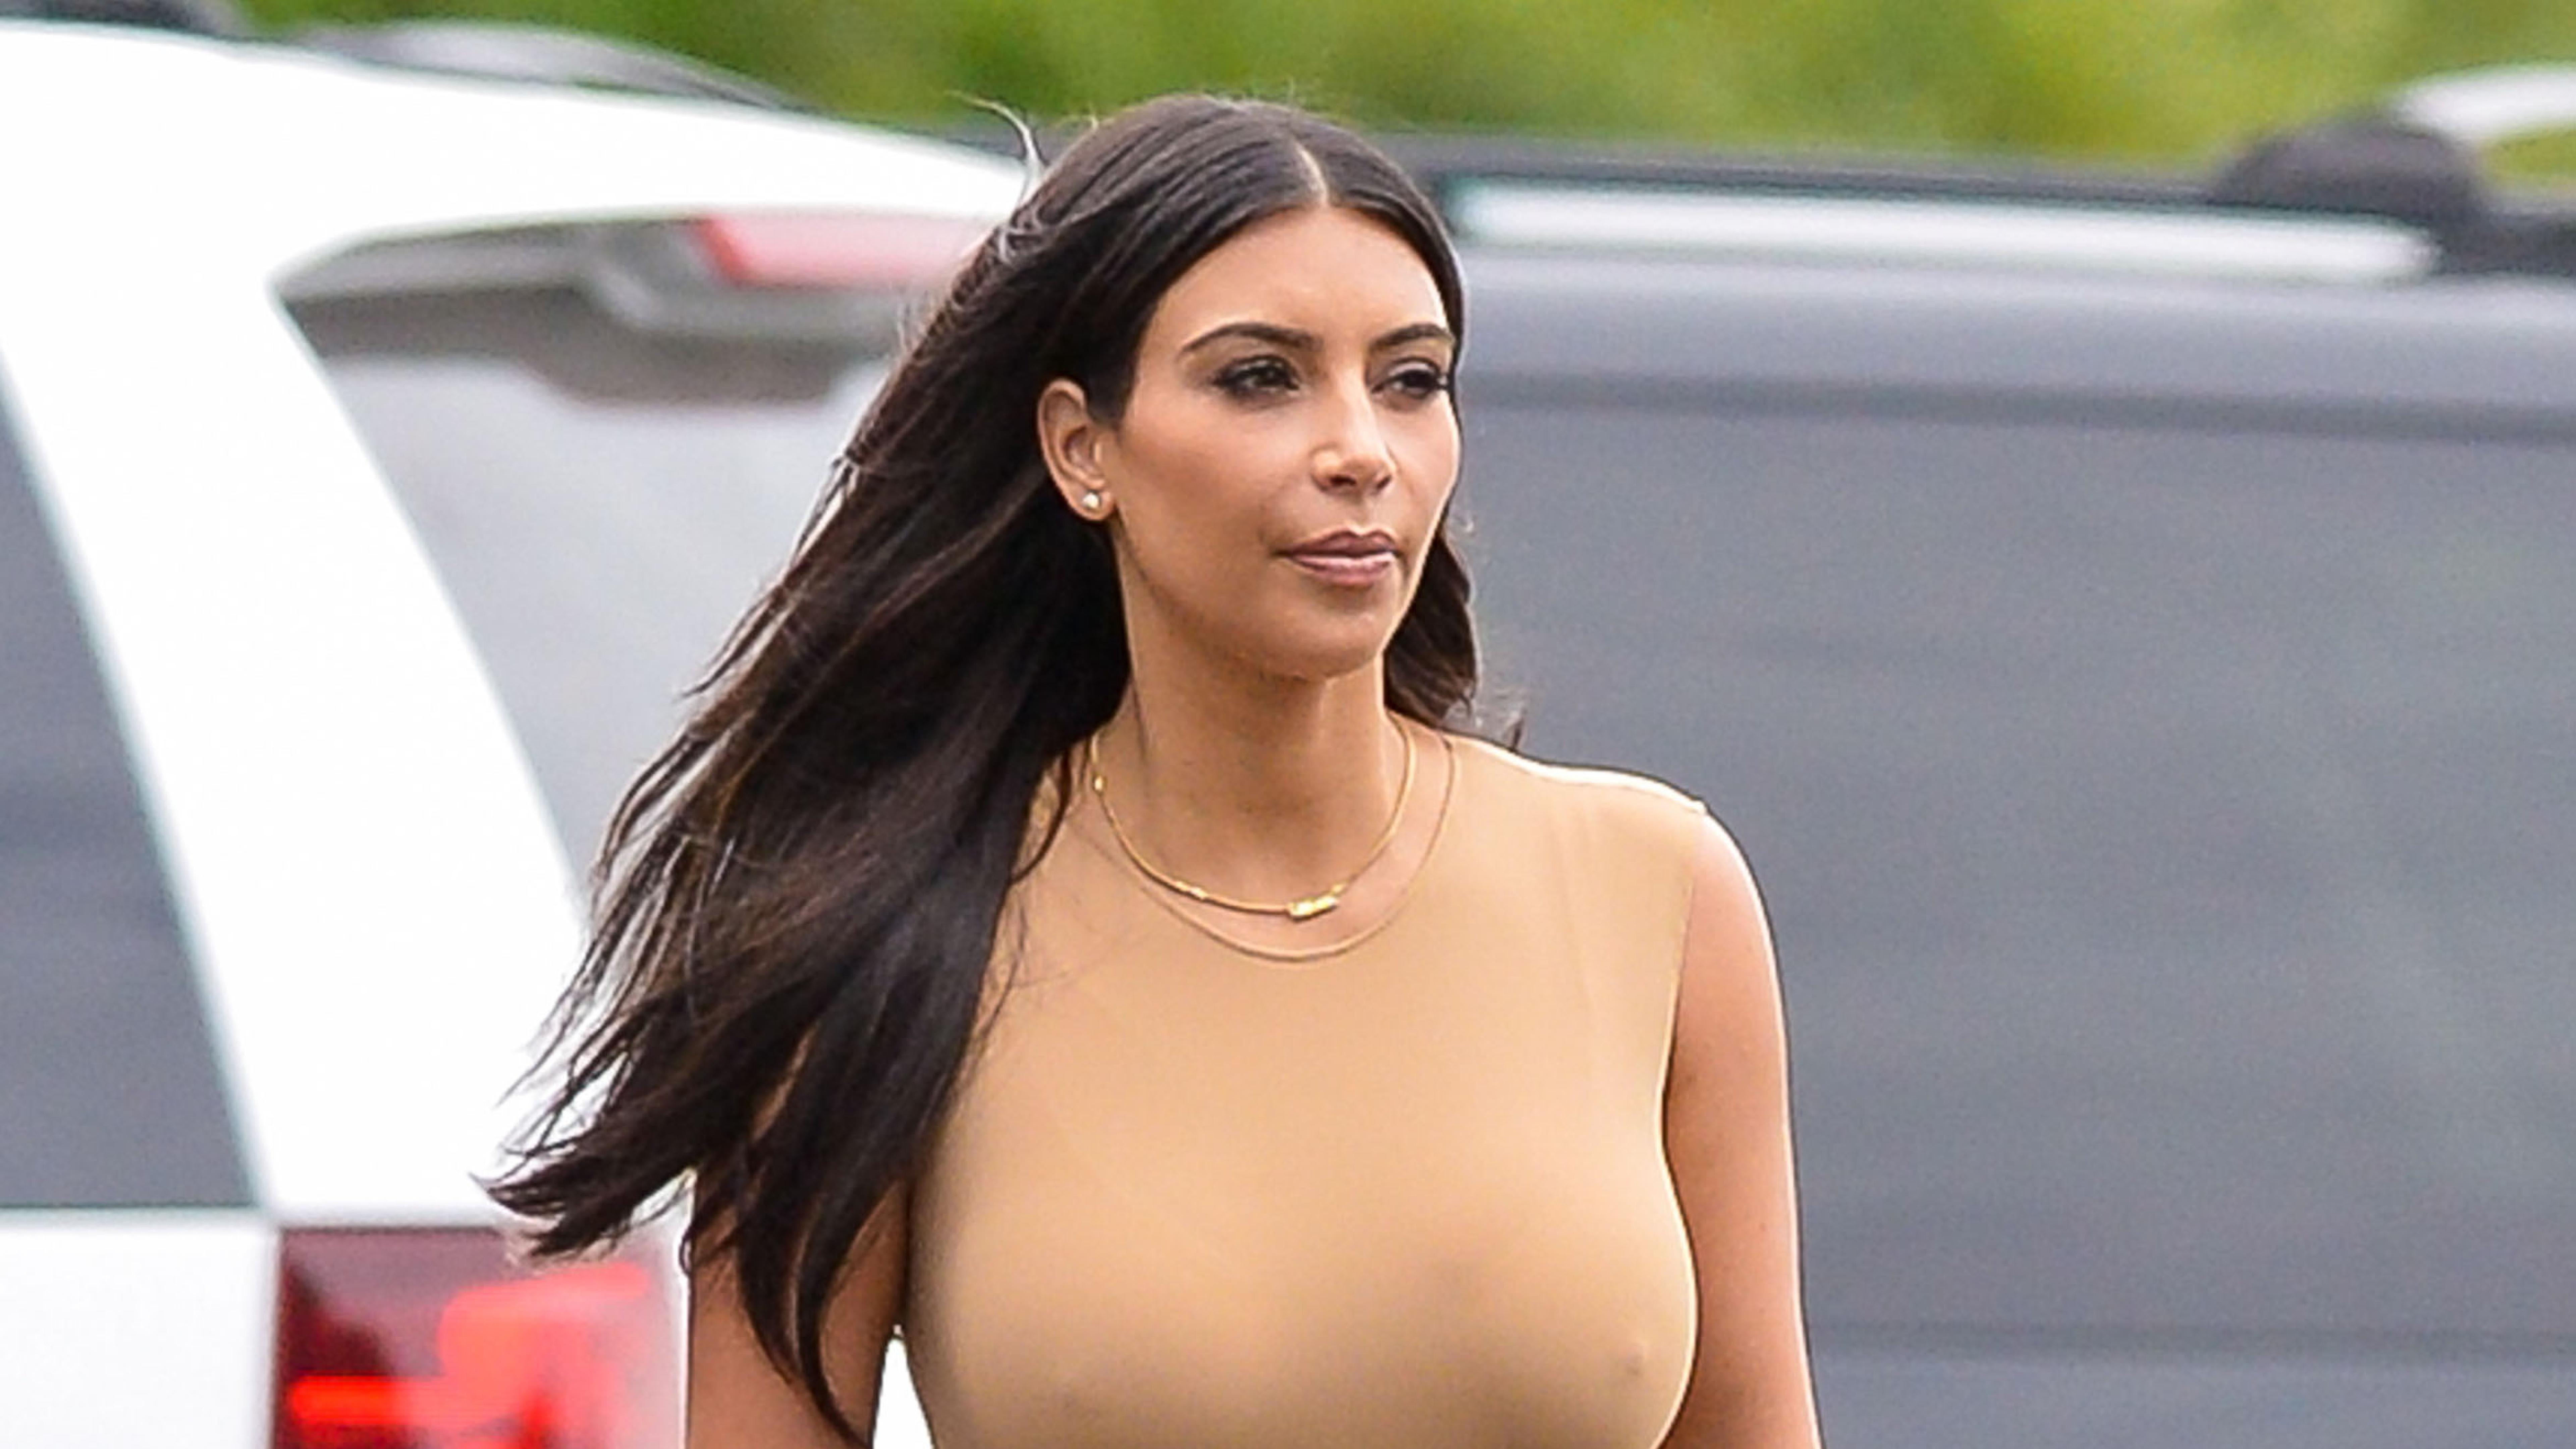 Kim Kardashian Big Boobs, Full Hd 2K Wallpaper-6344